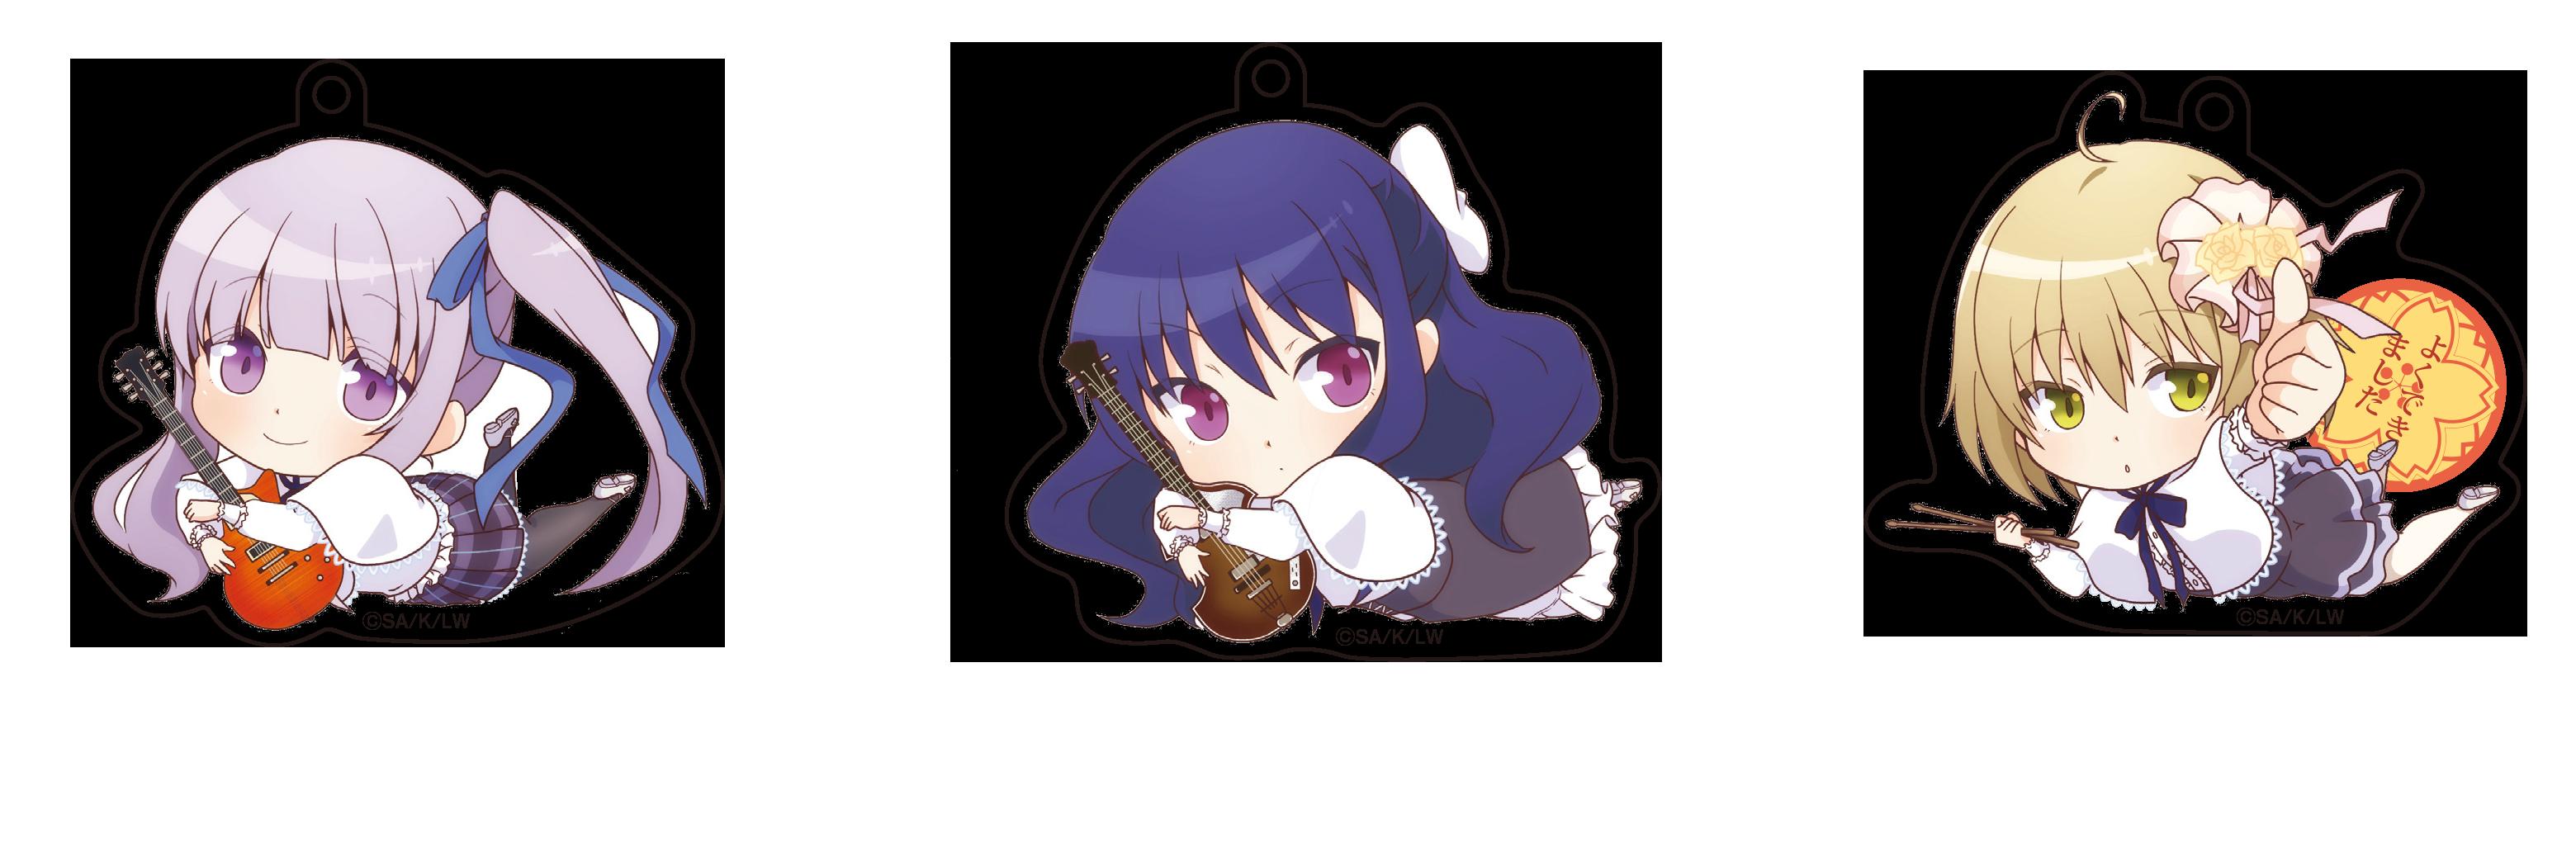 acr_key_ 天使の3P!SD_パス付